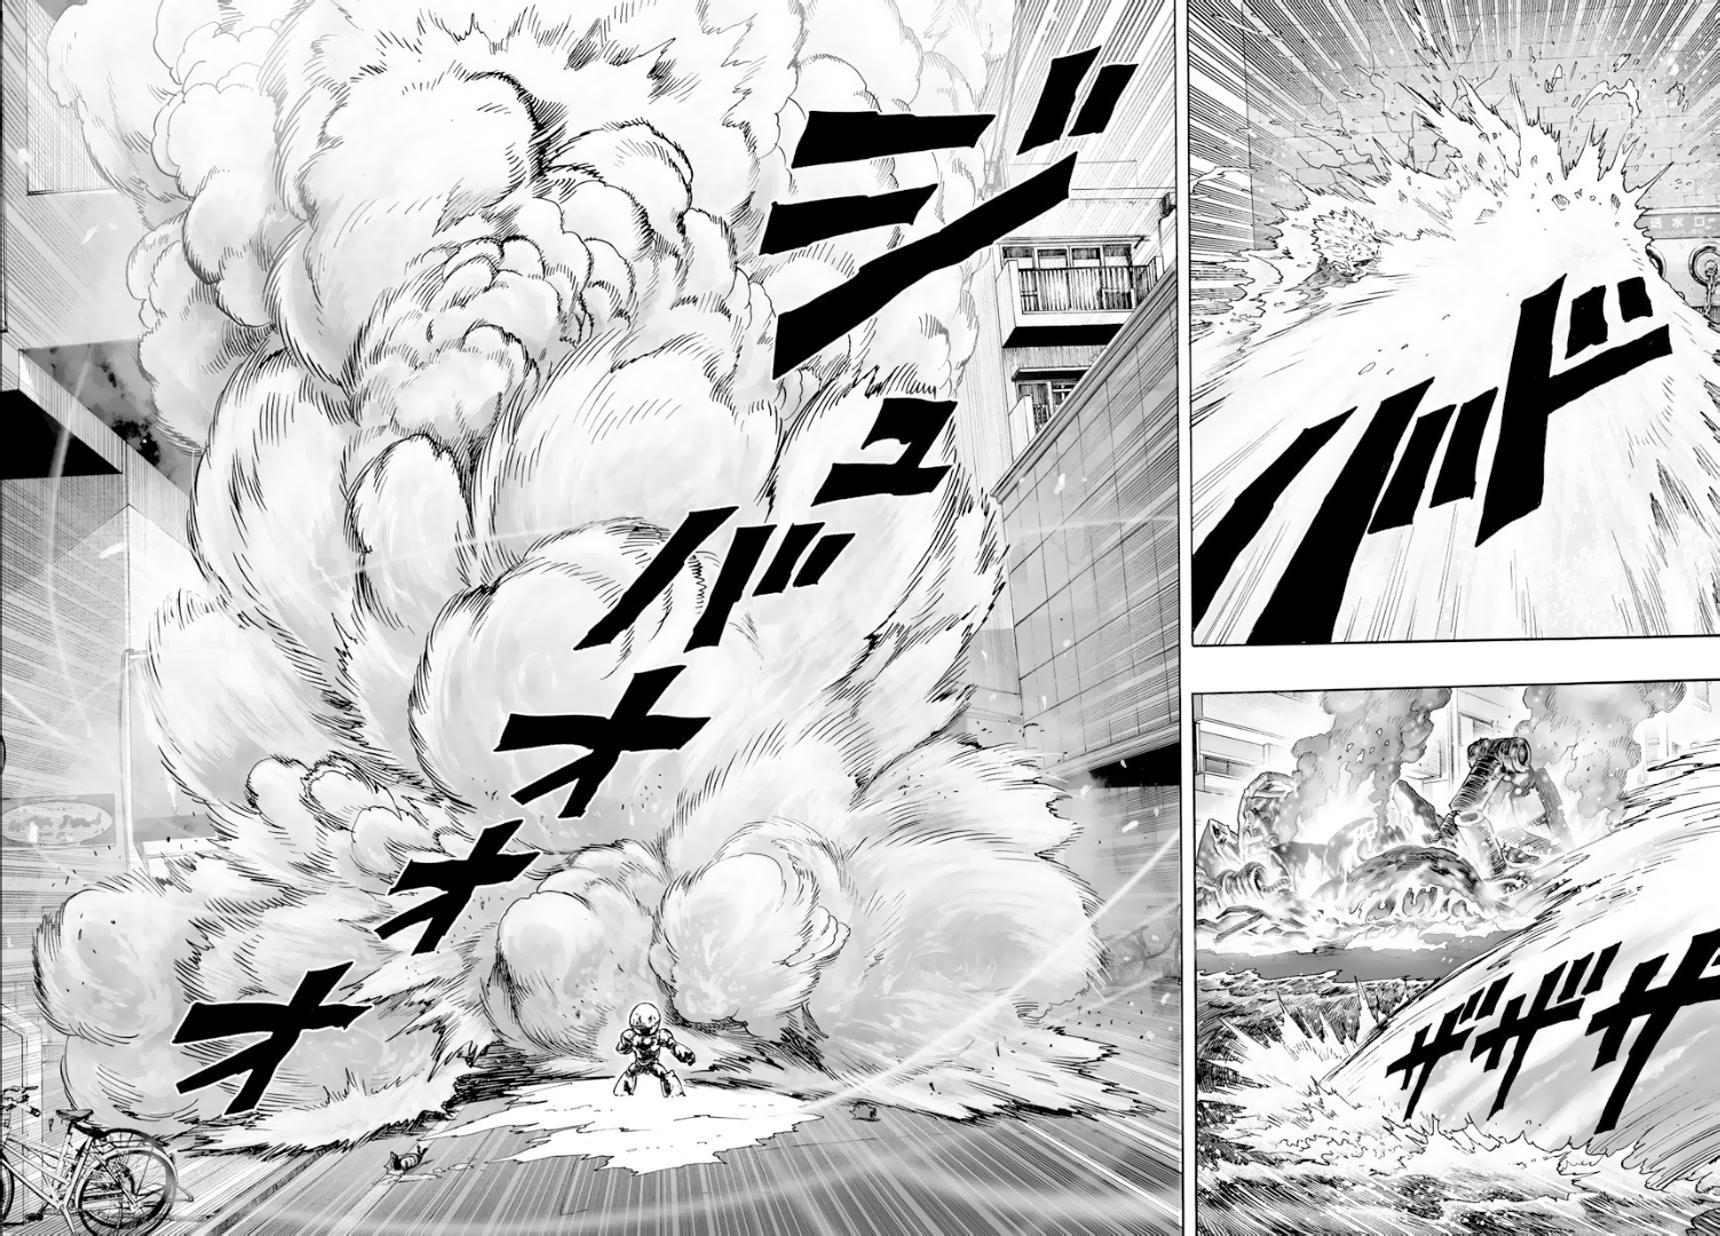 http://c5.ninemanga.com/es_manga/21/14805/362327/77ad1b08d270a09847d038fd8f5ce0f5.jpg Page 8